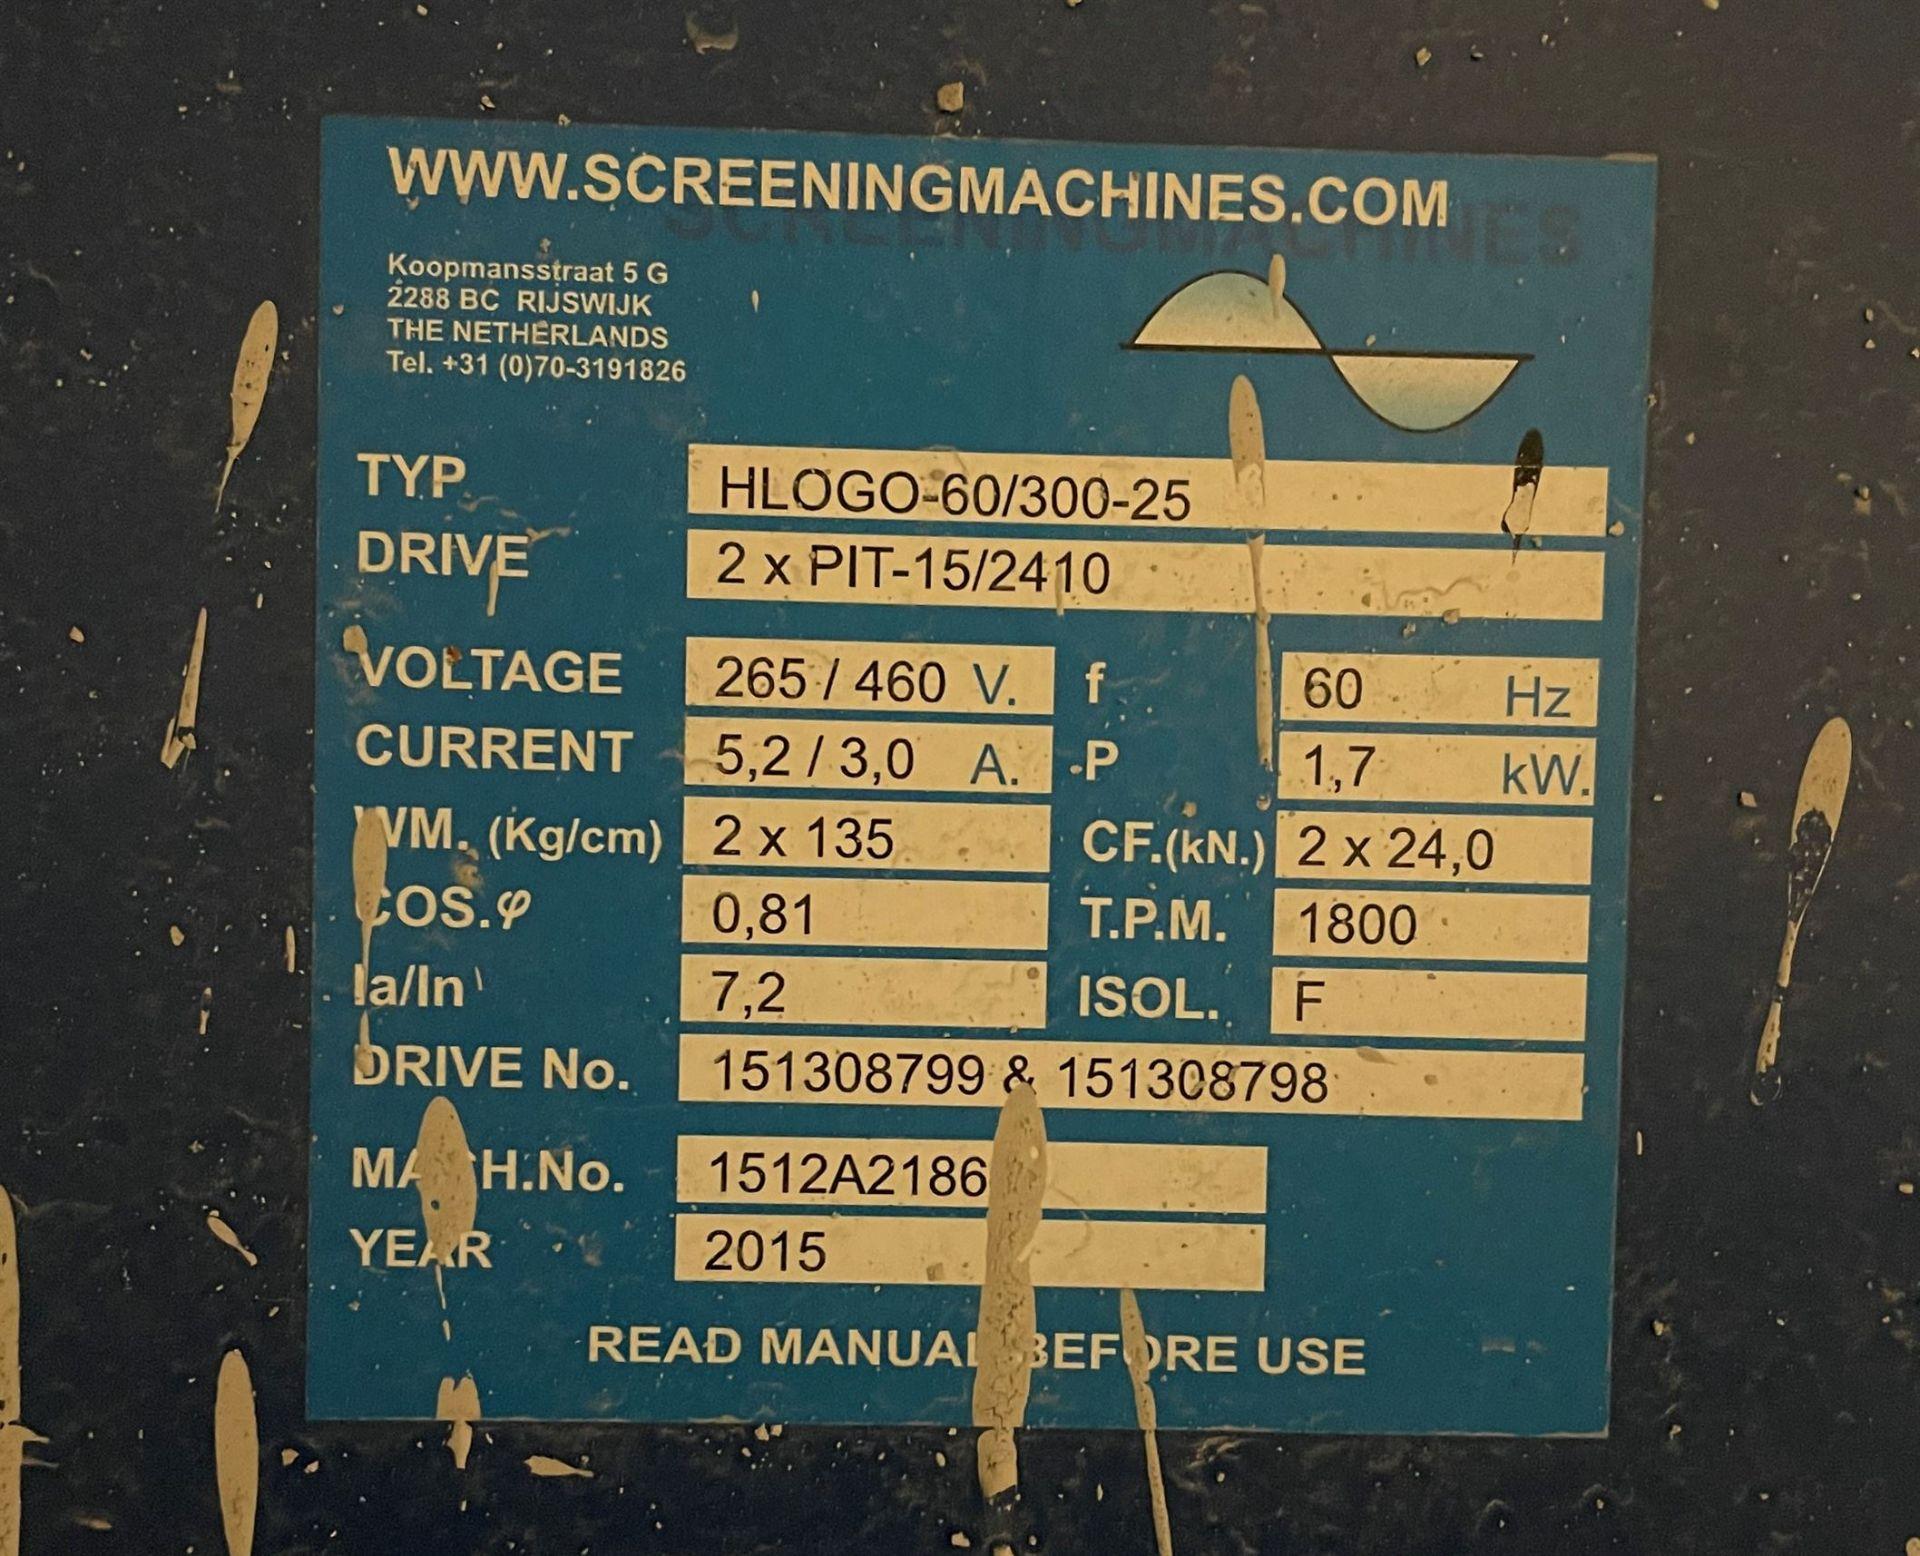 2015 SCREENING MACHINES HLOGO-60/300-25 Shaker Screen, s/n 1512A2186, 600 x 3000 x 250mm Trough, (2) - Image 6 of 12